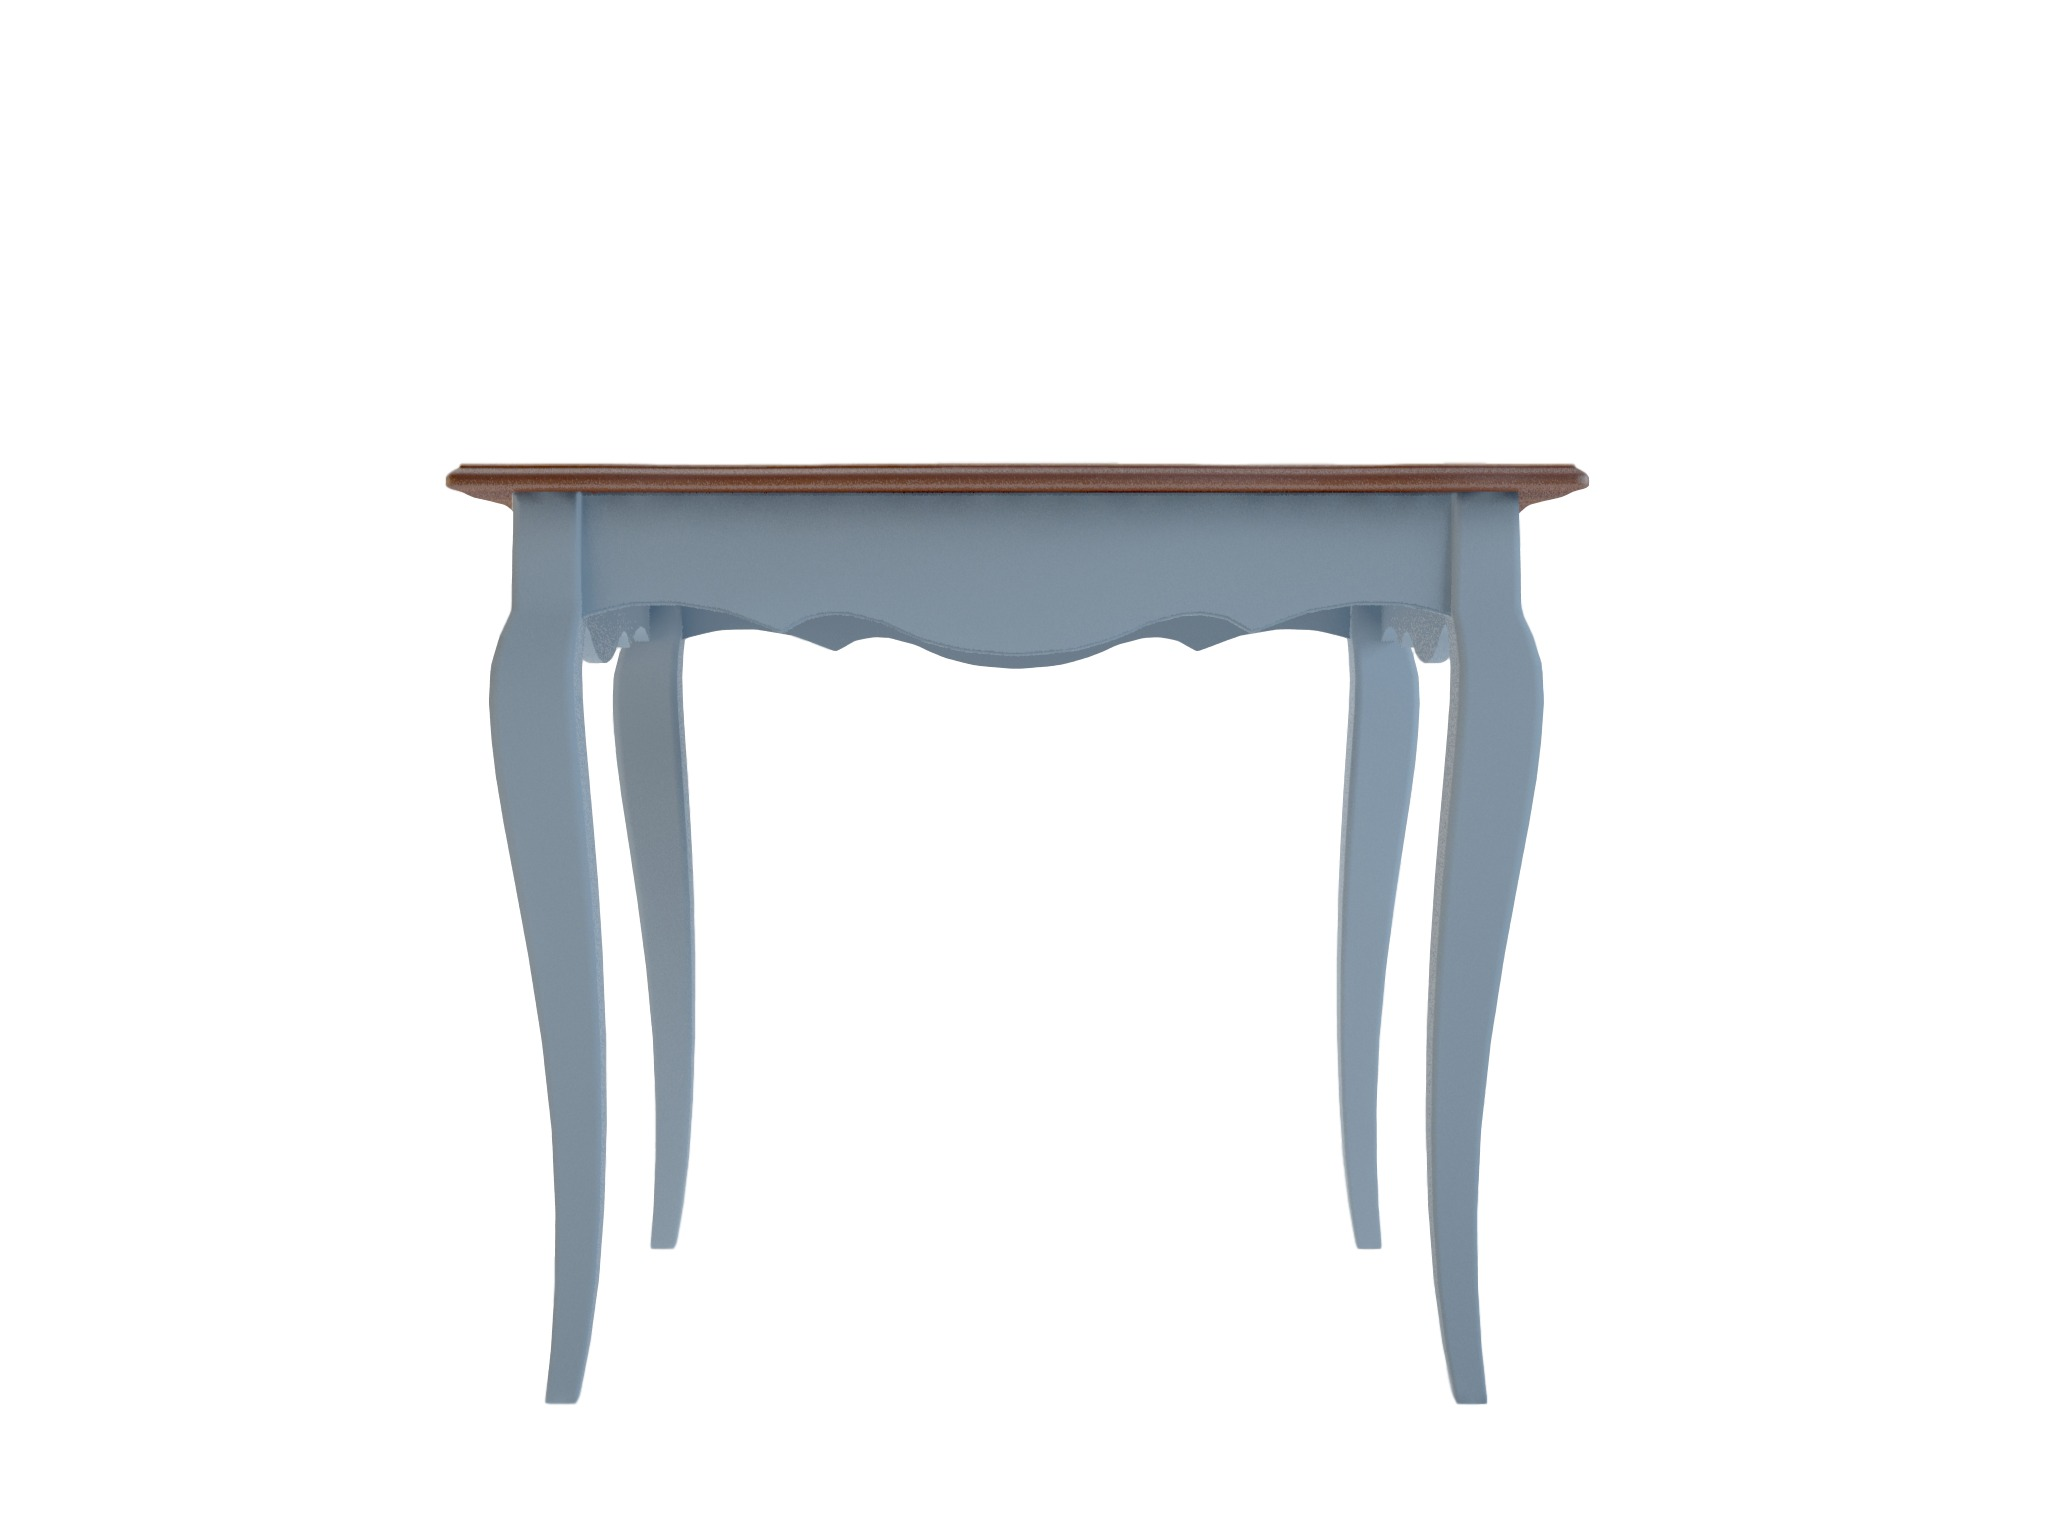 Обеденный стол LeontinaОбеденные столы<br><br><br>Material: Береза<br>Width см: 90<br>Depth см: 90<br>Height см: 75